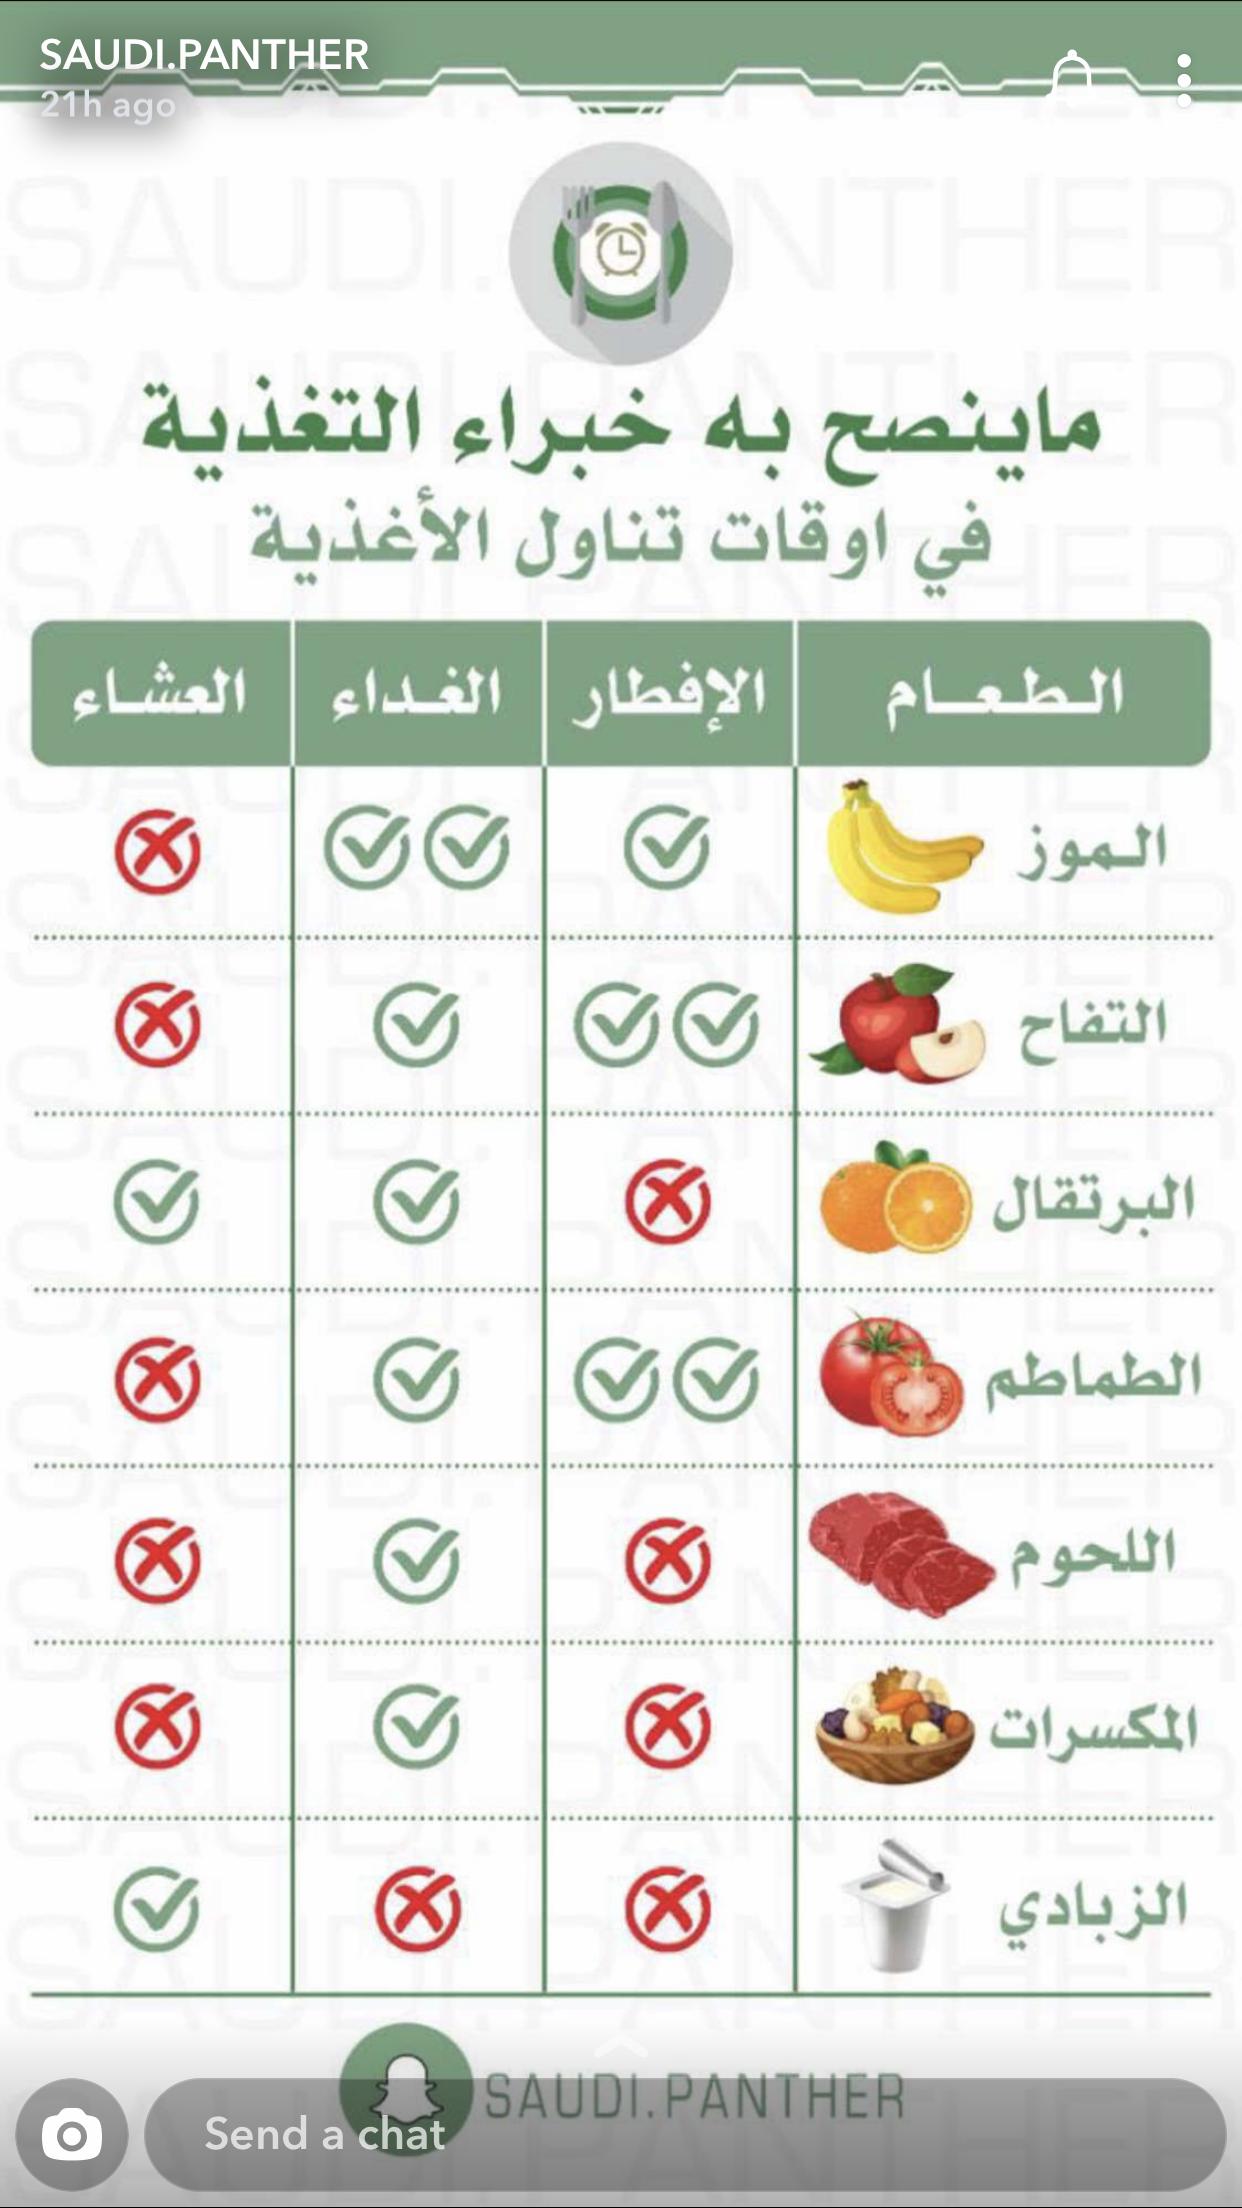 Pin By منوعات مفيدة On معلومات صحية Health Fitness Food Health Facts Food Health Facts Fitness